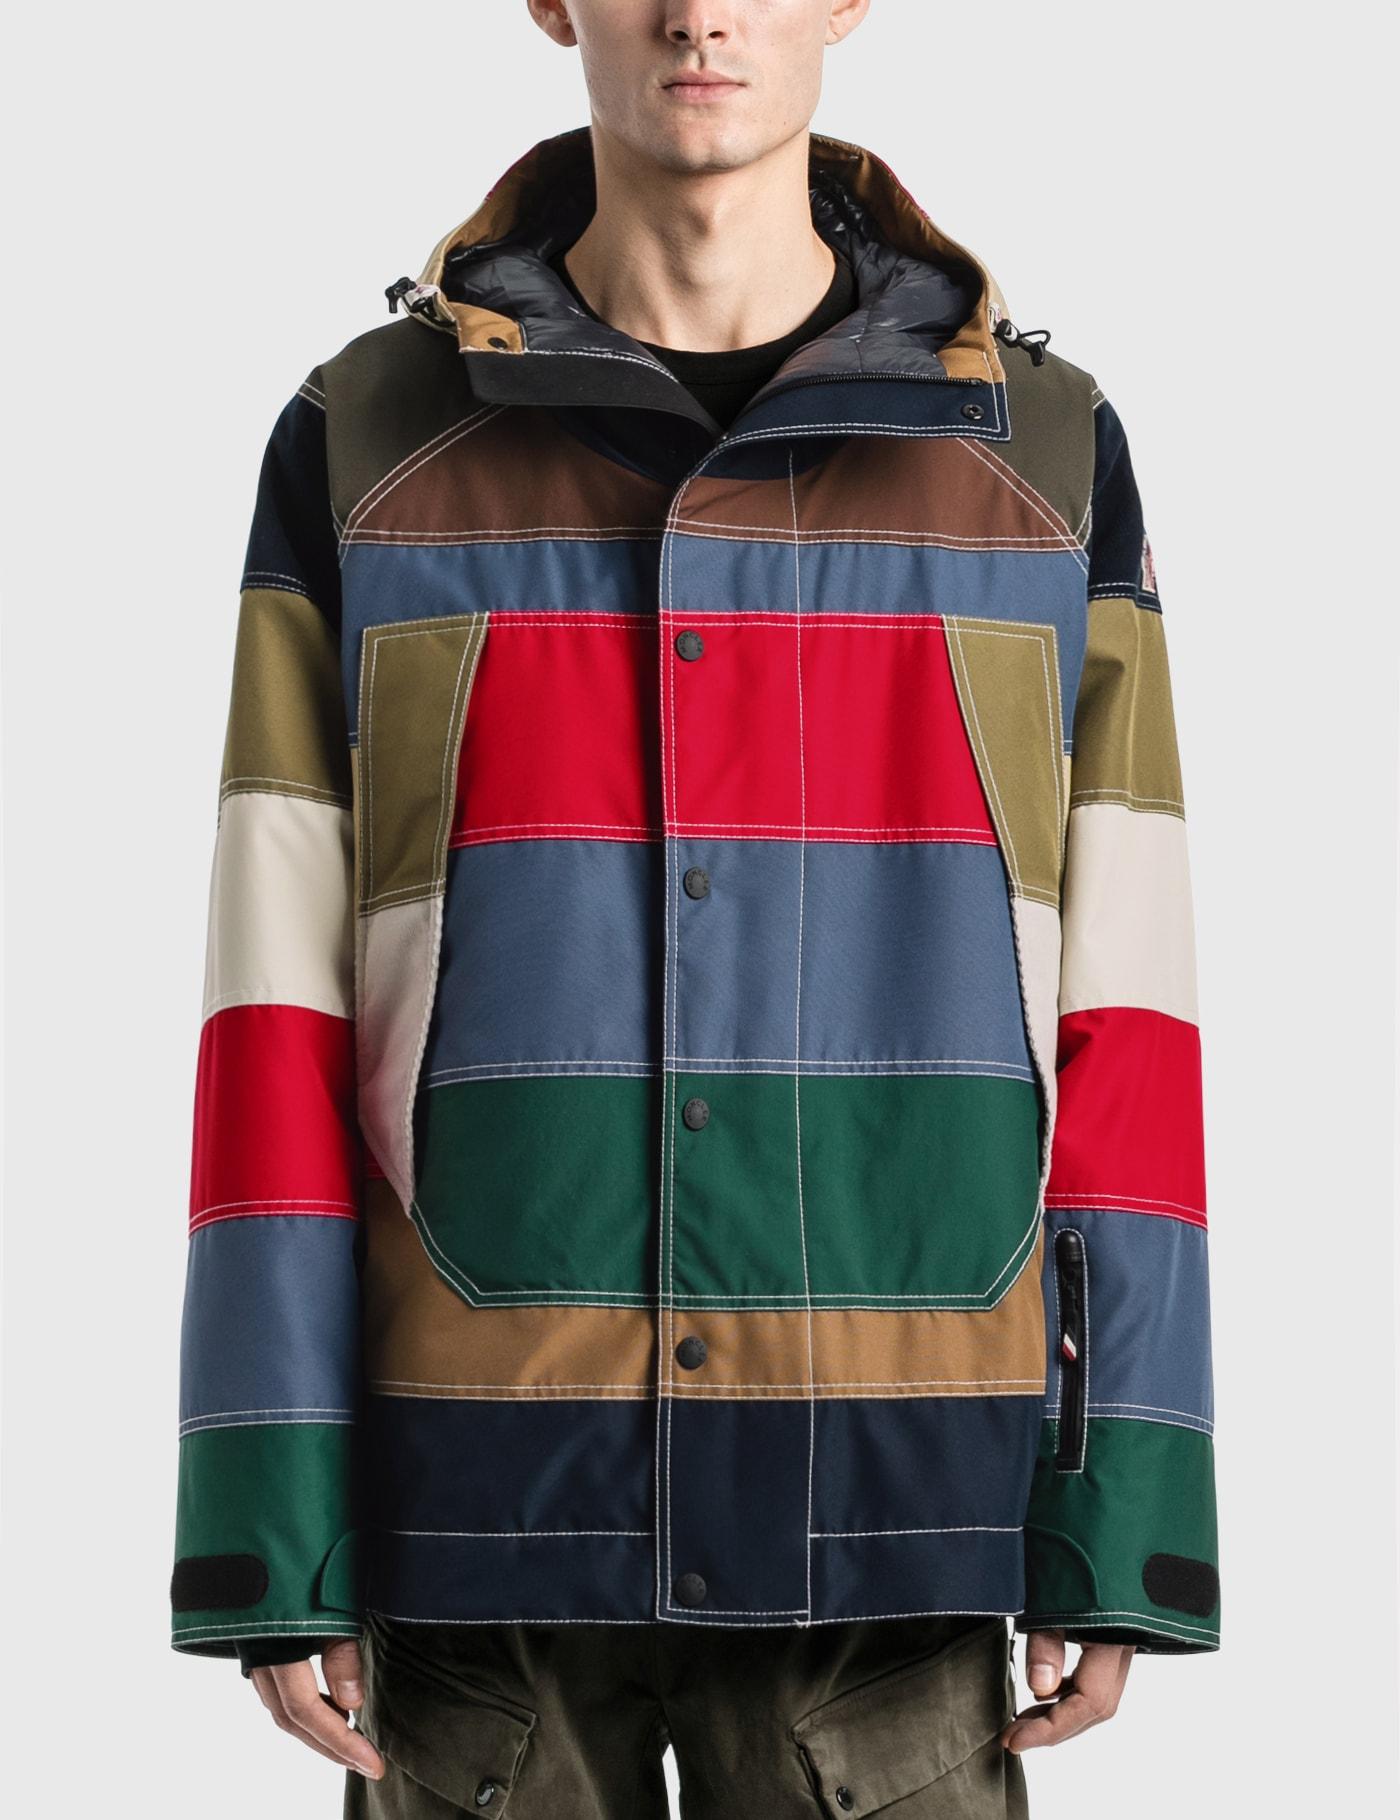 Moncler Grenoble Chetoz Jacket